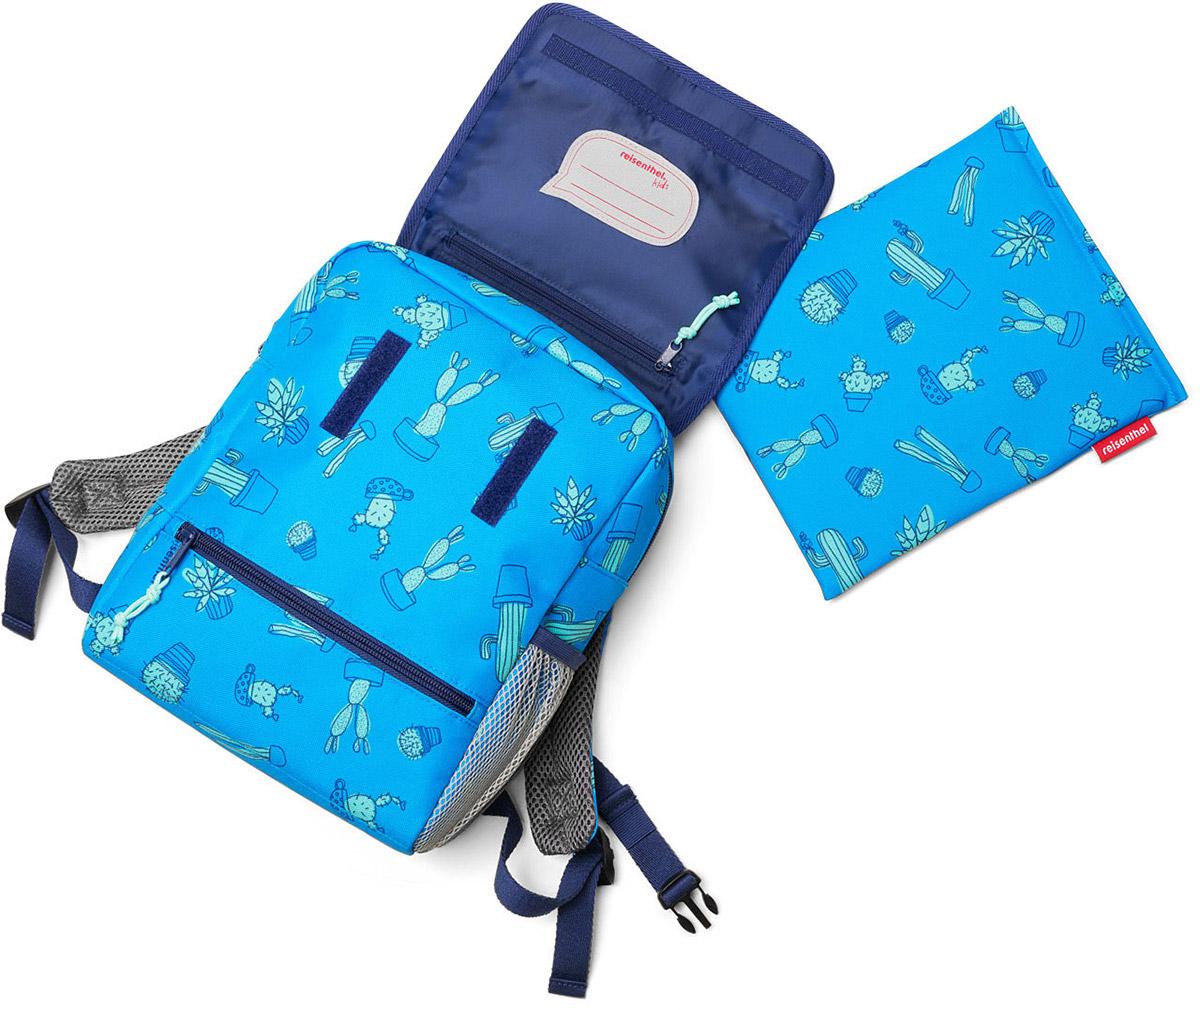 914a0427ed04f Plecak dla dzieci Backpack Cactus Reisenthel niebieski